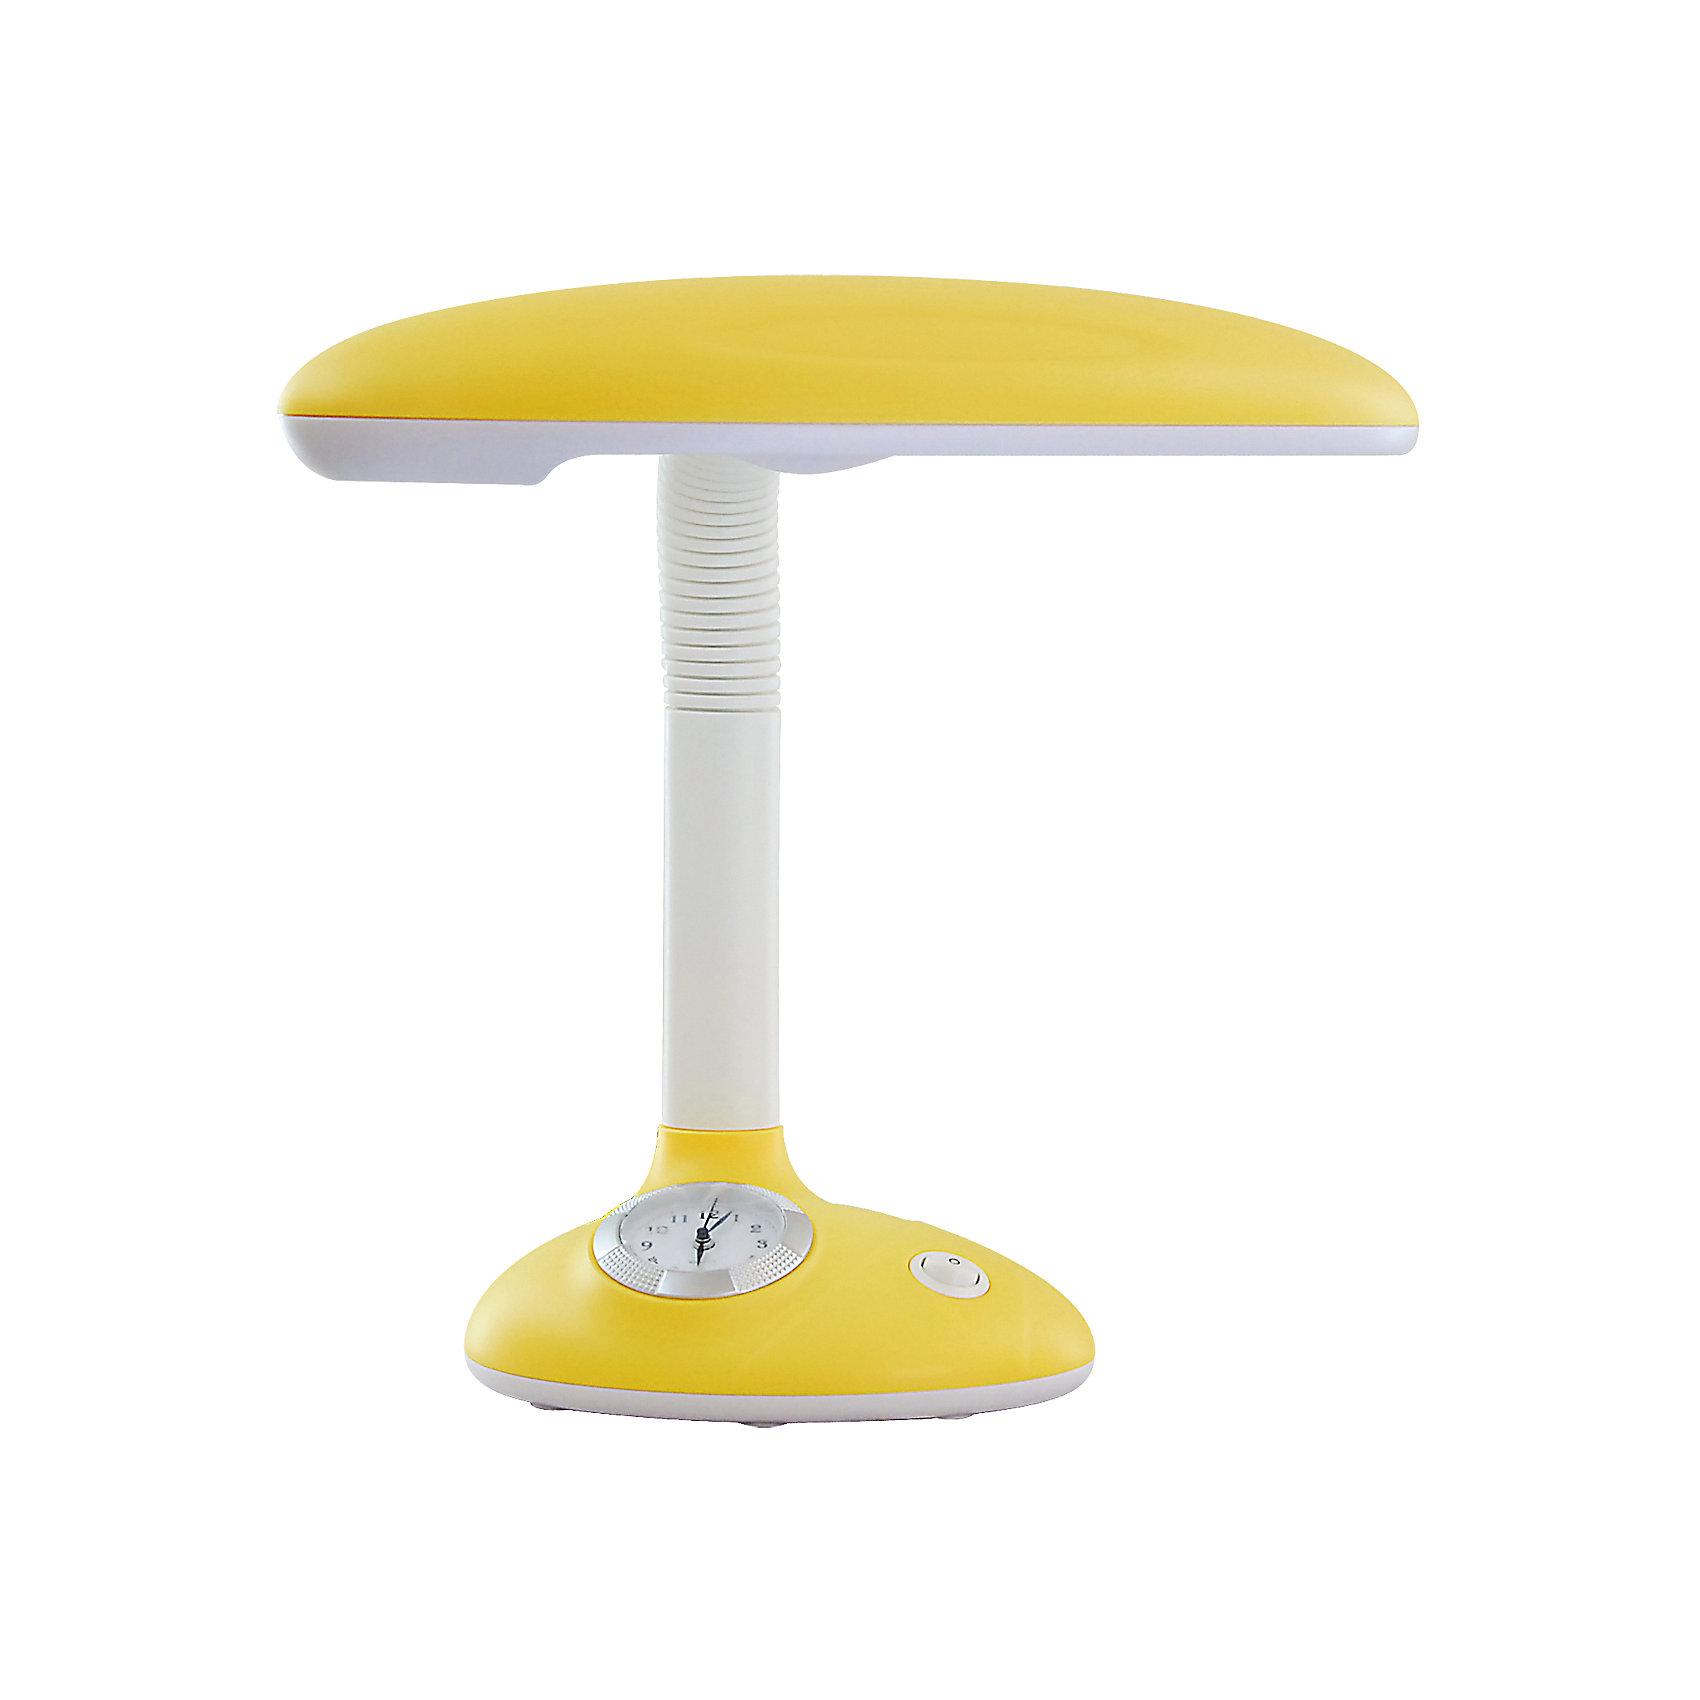 Жёлтый светильник-часы, 11 Вт